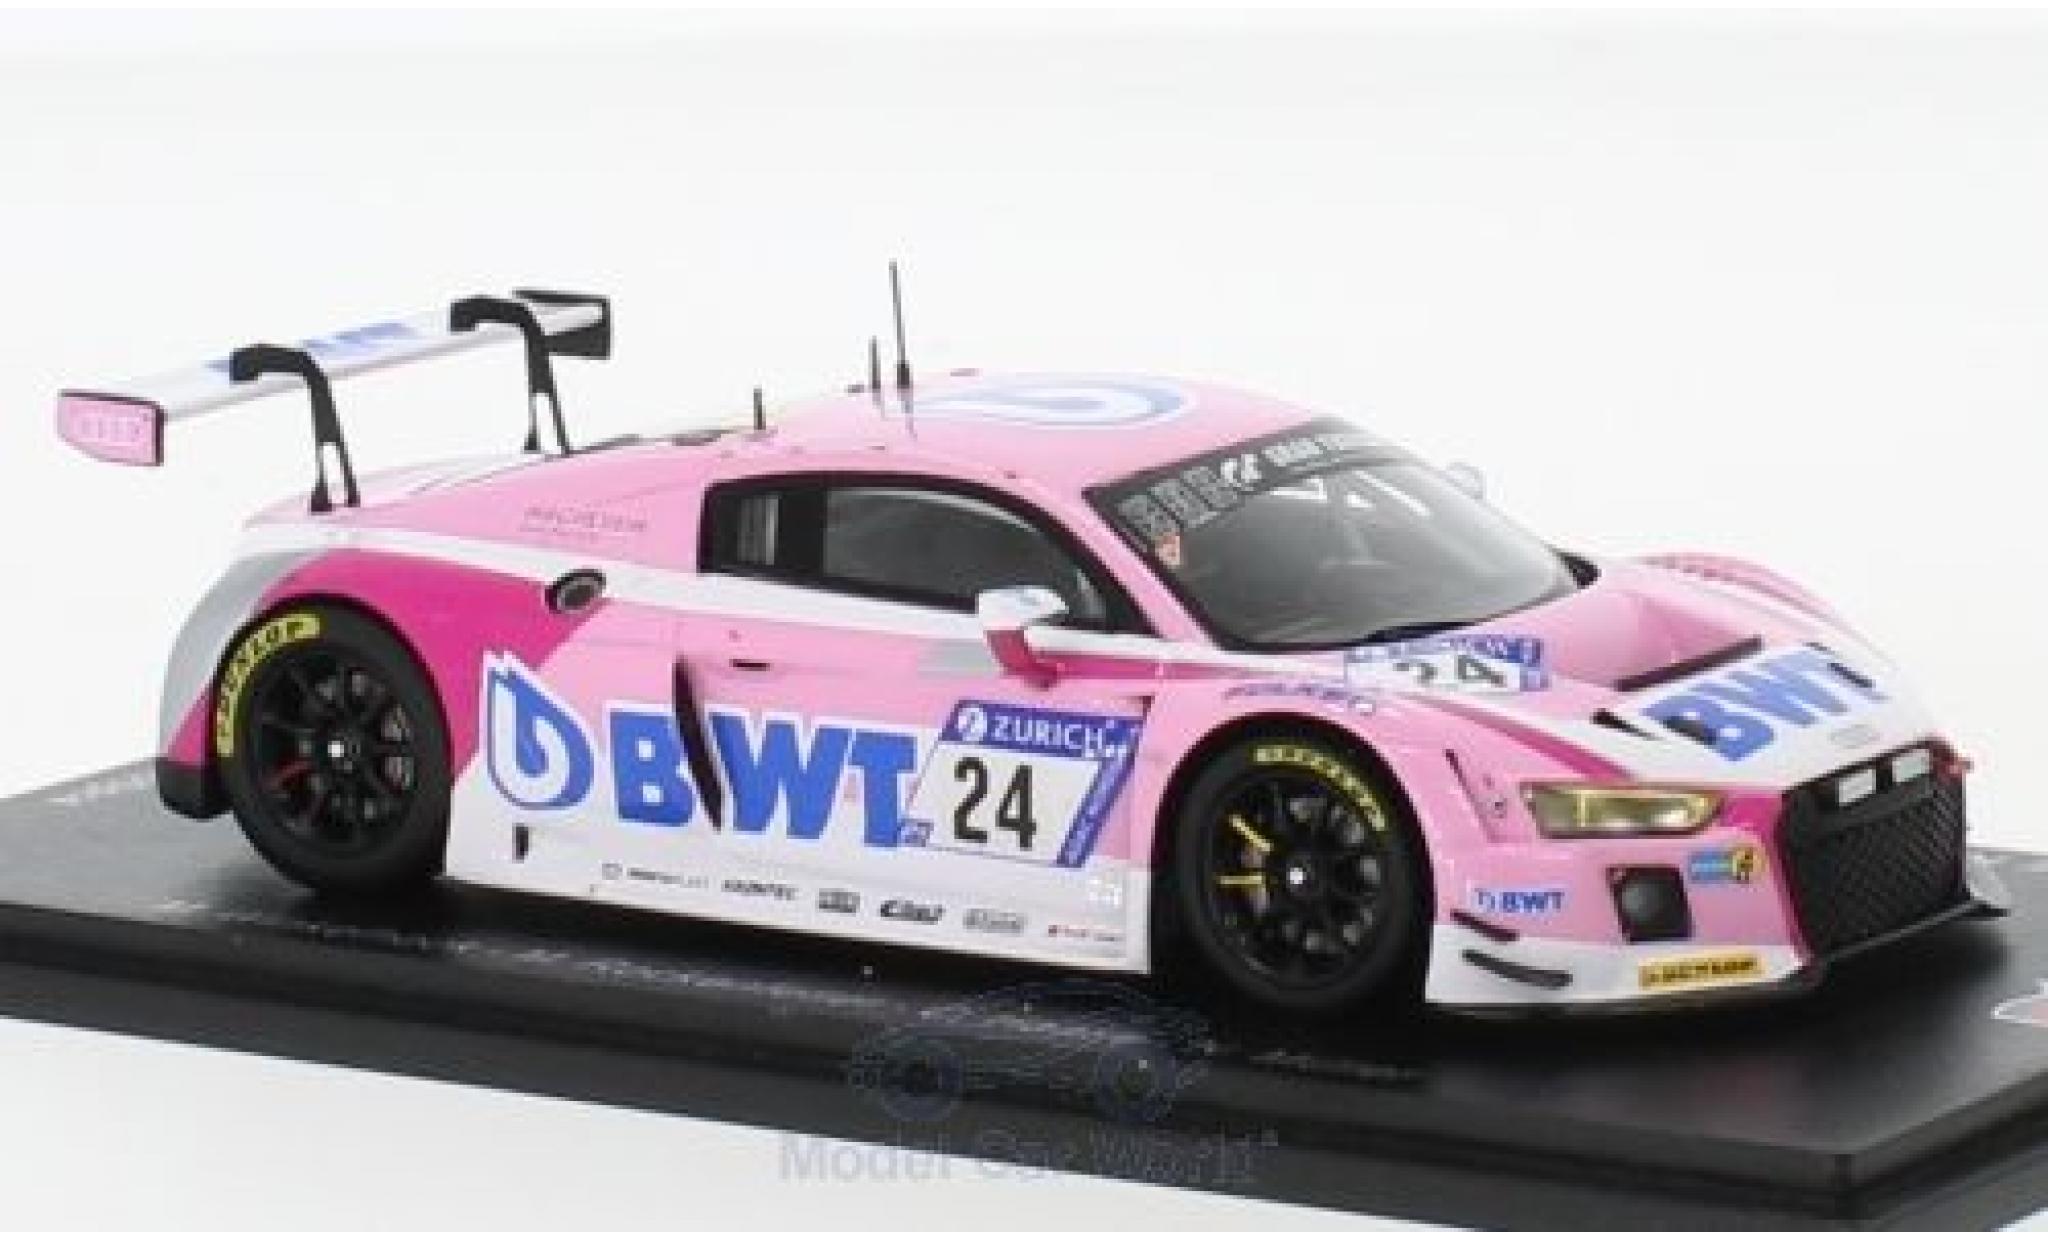 Audi R8 1/18 Spark LMS No.24 Sport Team BWT 24h Nürburgring 2018 M.Winkelhock/M.Rockenfeller/C.Haase/N.Müller